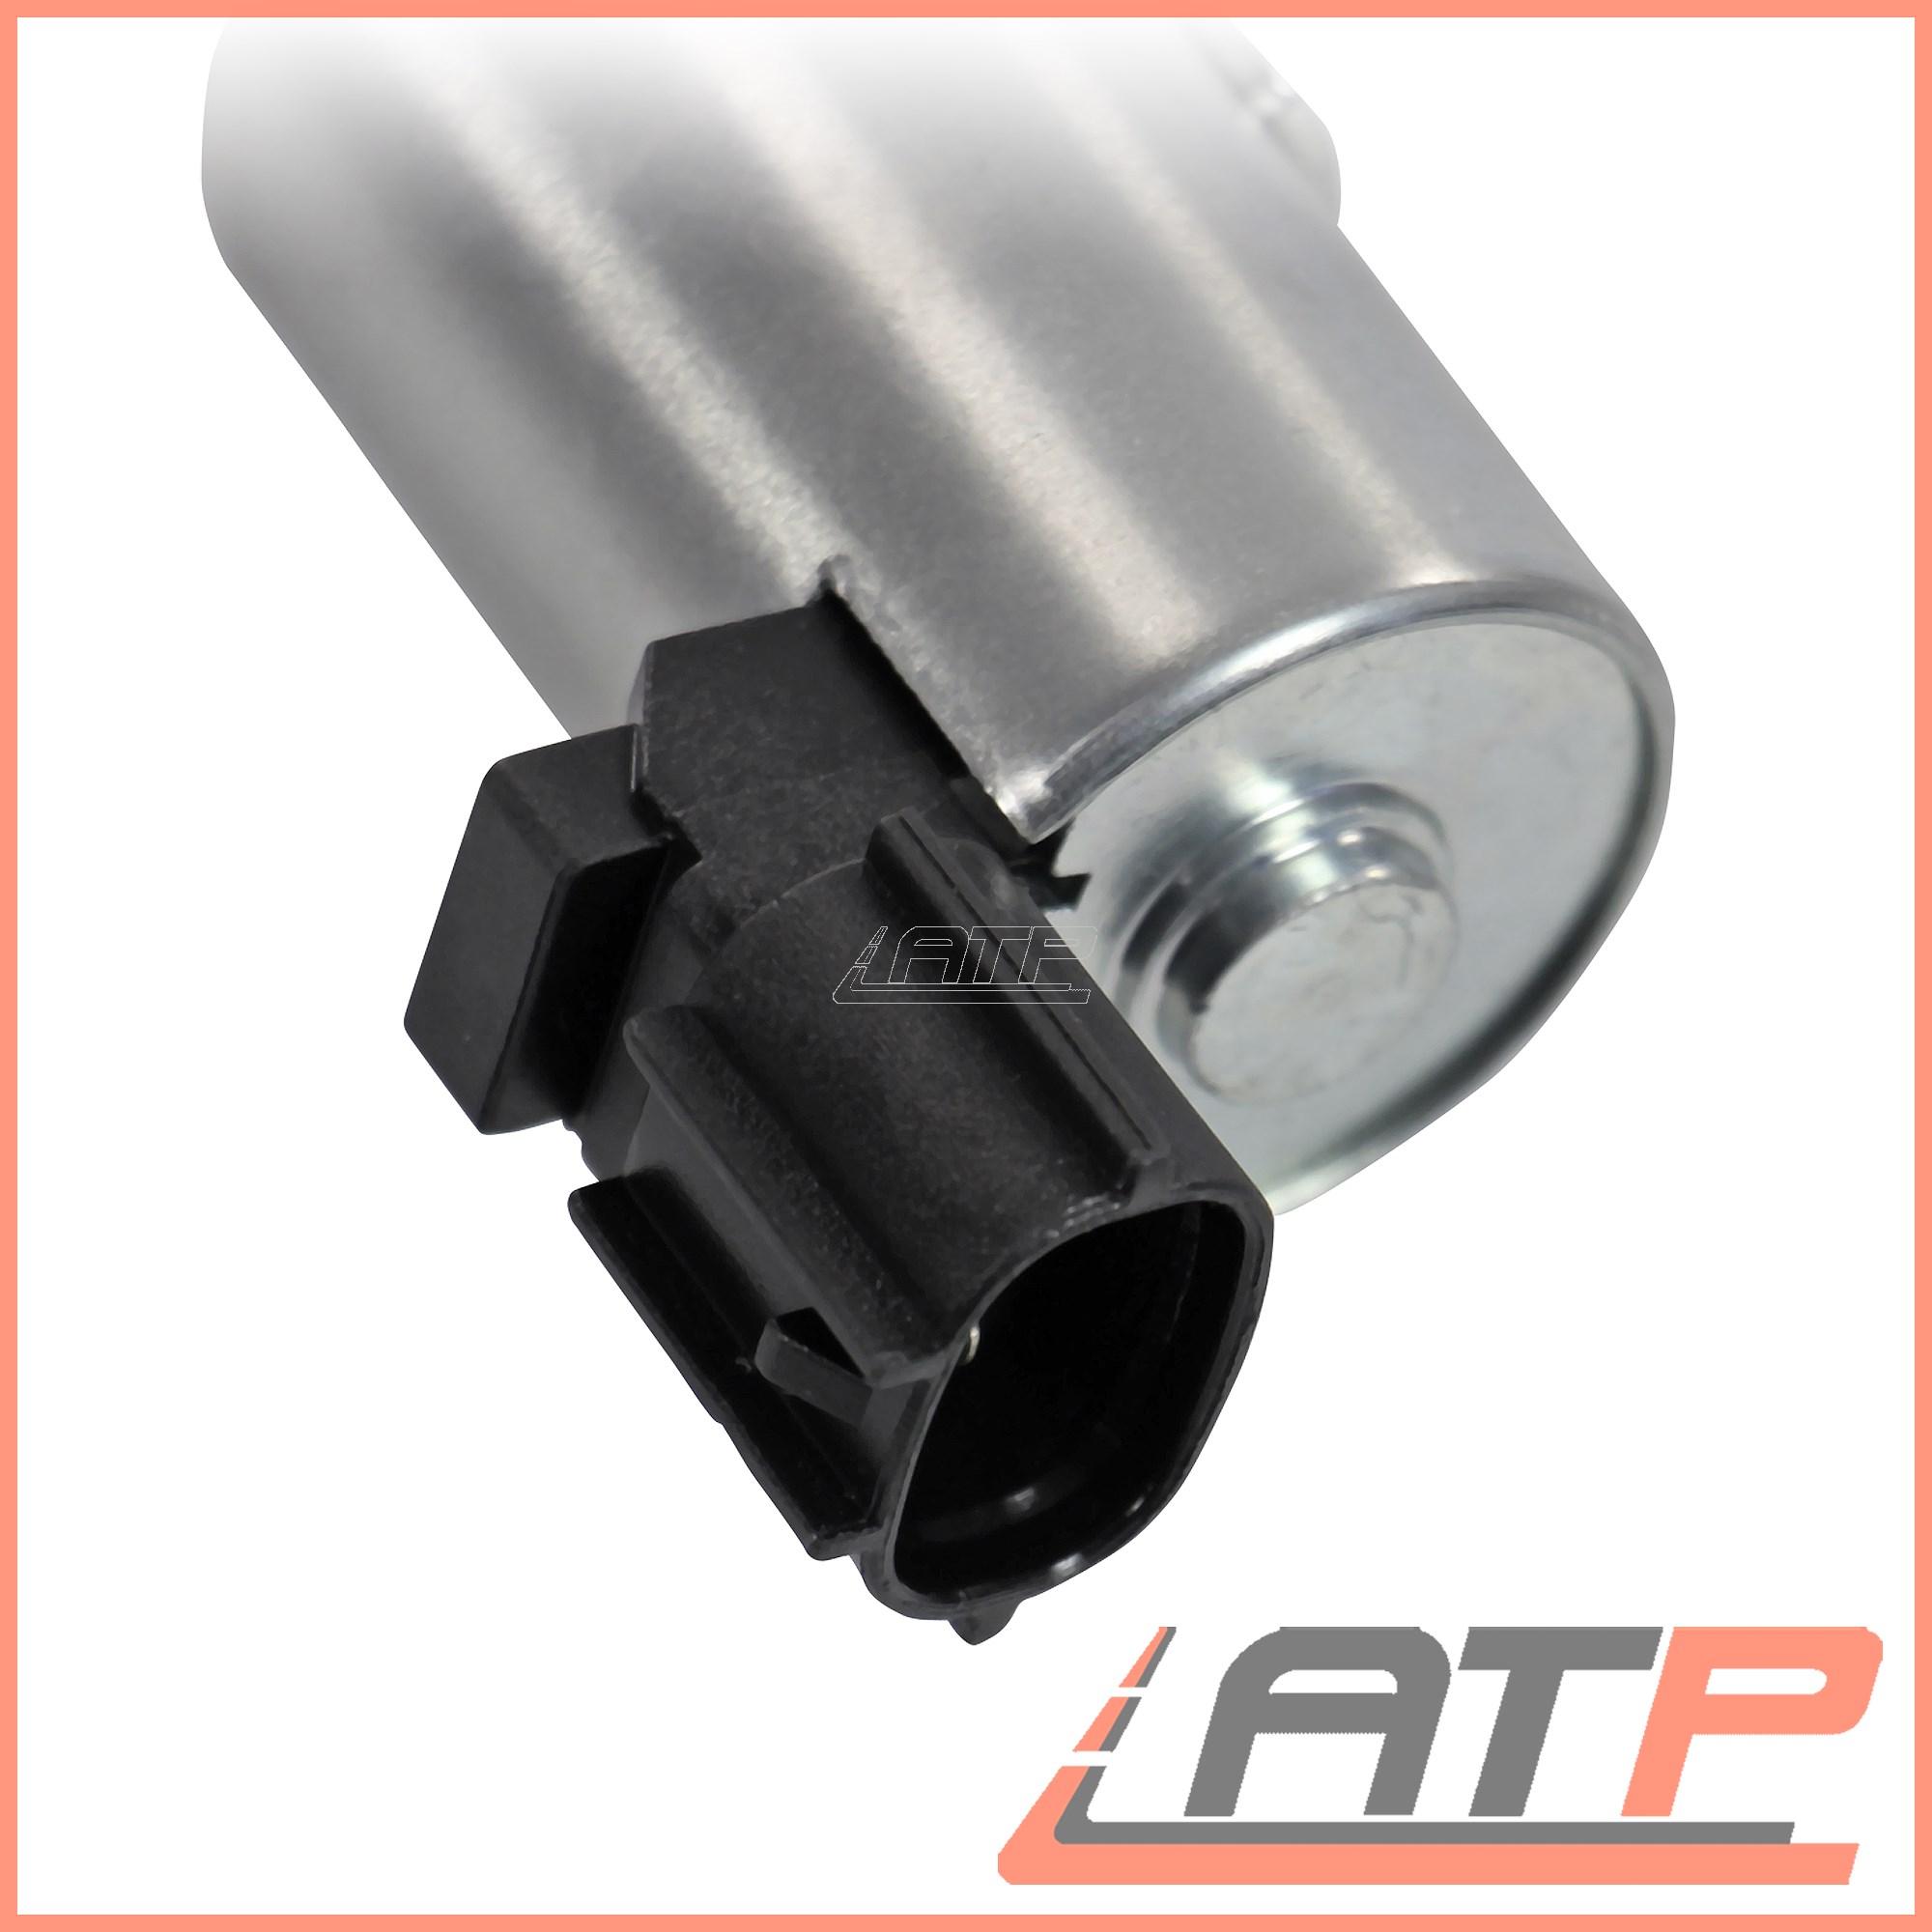 Solenoide-valvula-de-control-de-ajuste-del-arbol-de-levas-1X-Toyota-Avensis-T22-2-0-00-03 miniatura 6